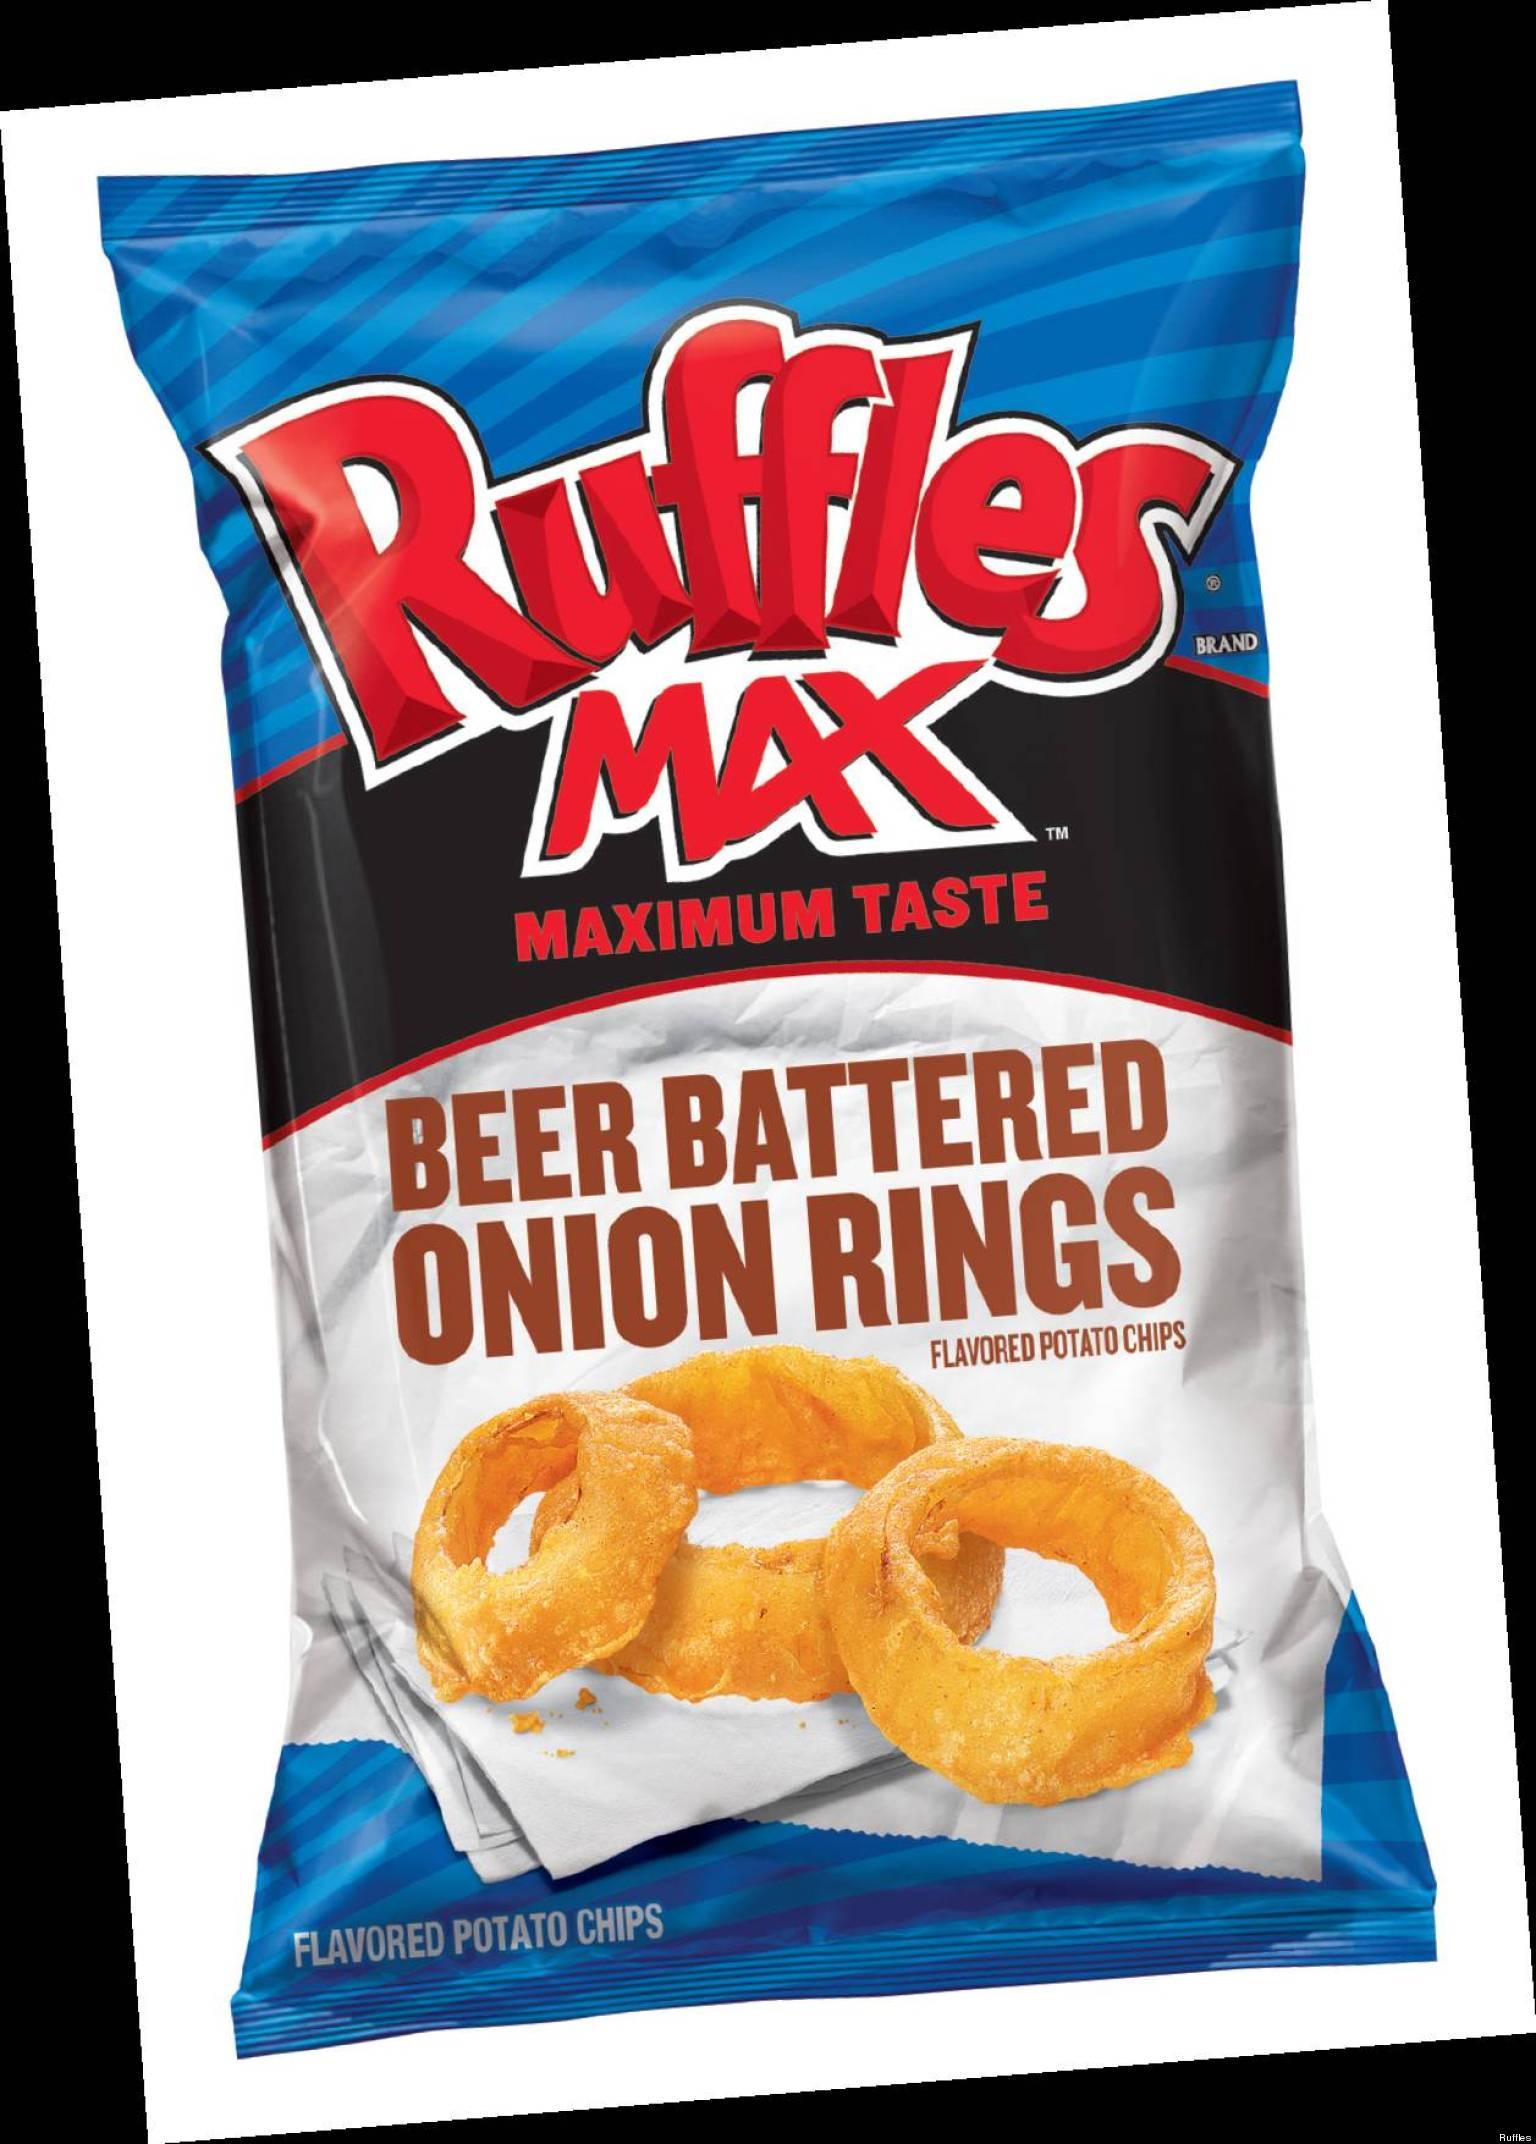 Ruffles MAX Debuts Beer Battered Onion Rings Potato Chips